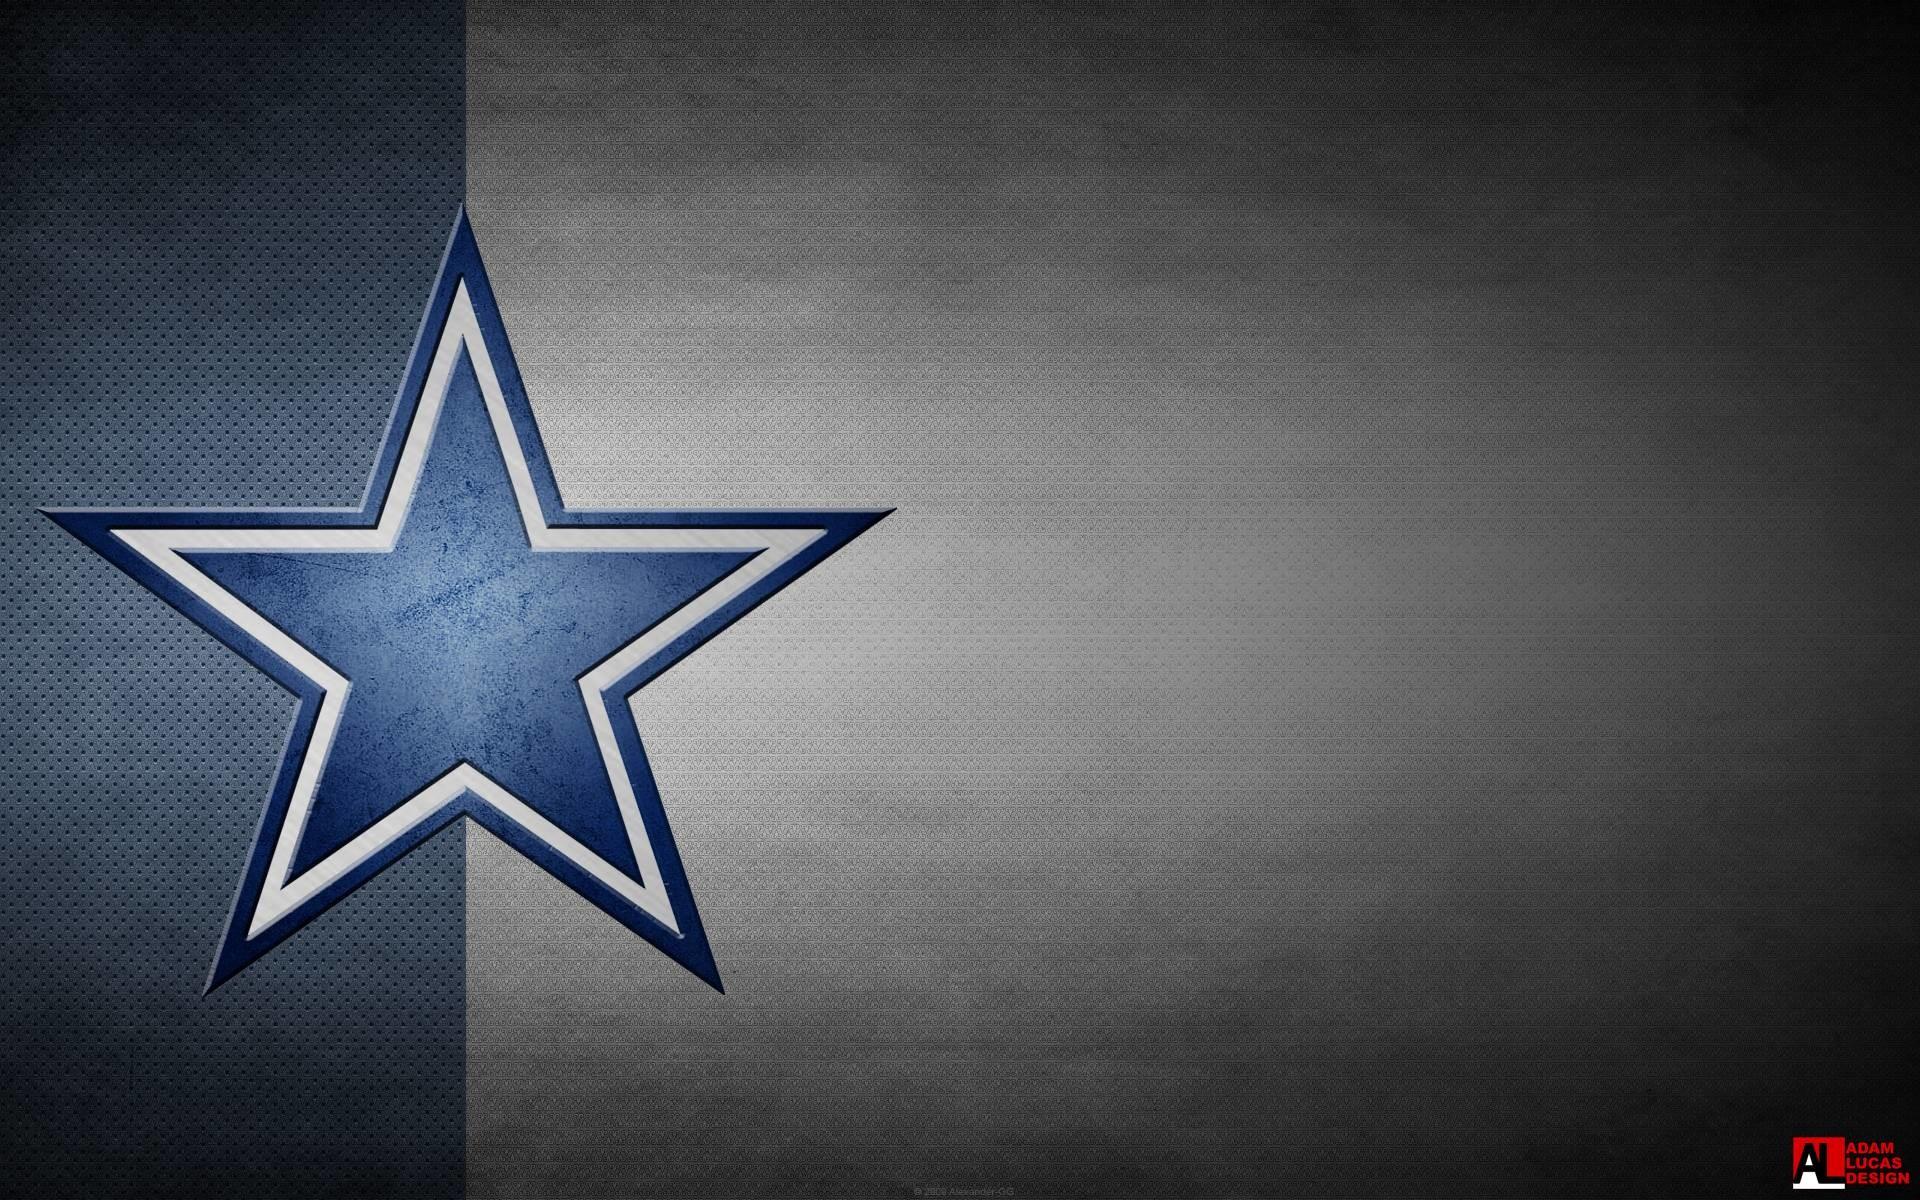 Dallas Cowboys Live Wallpapers Group | HD Wallpapers | Pinterest | Hd  wallpaper and Wallpaper